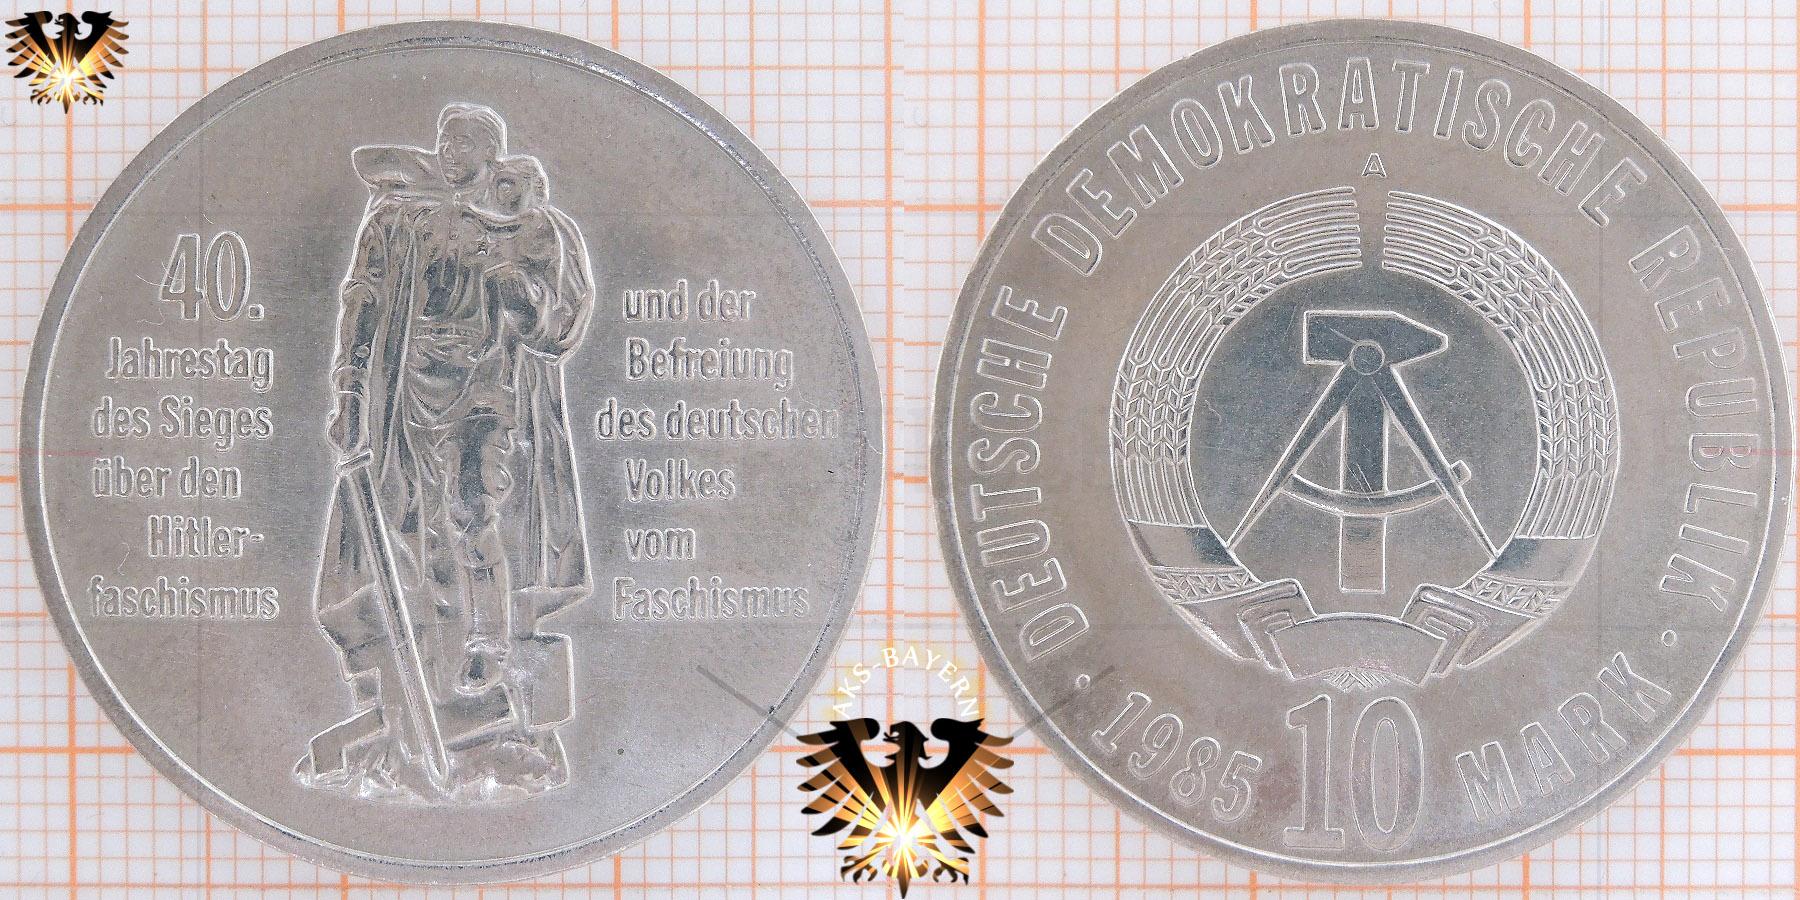 10 Mark Ddr 1985 40 Jahrestag Des Sieges über Den Hitler Faschismus